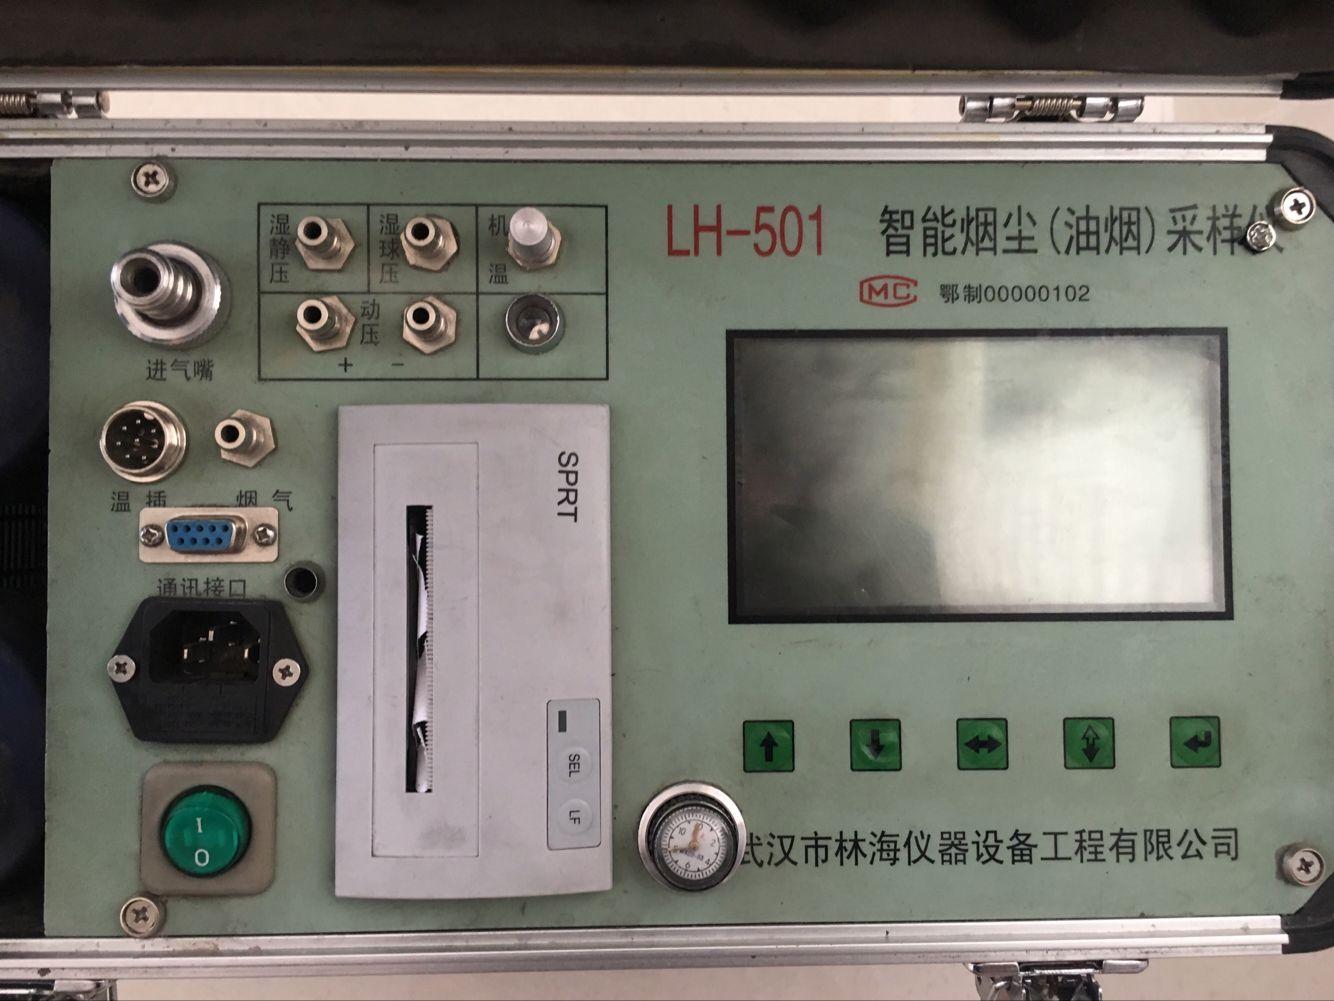 LH-501智能烟尘采样仪